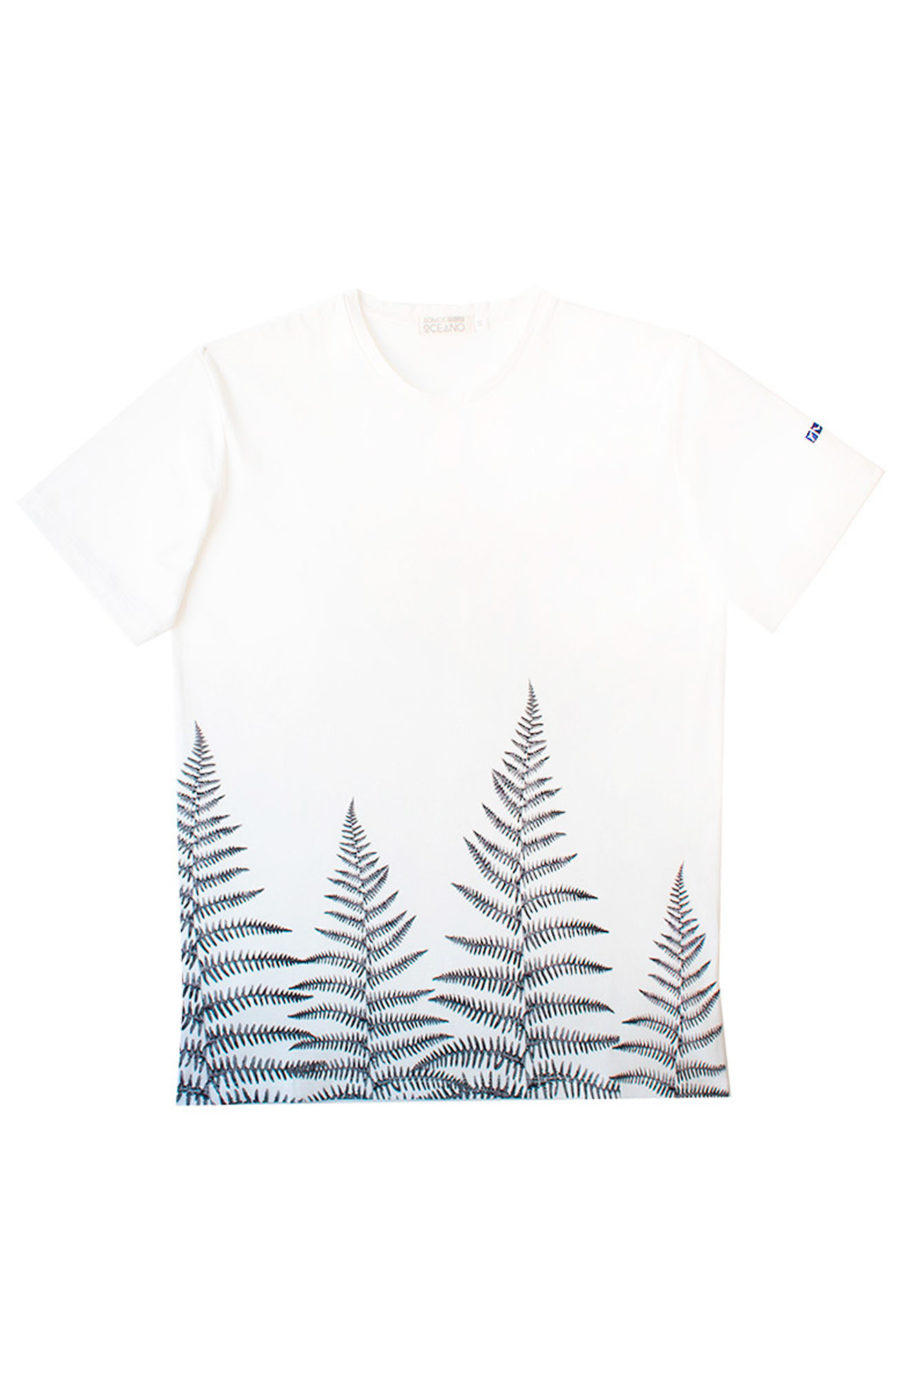 somosoceano-camiseta-hombre-fentos